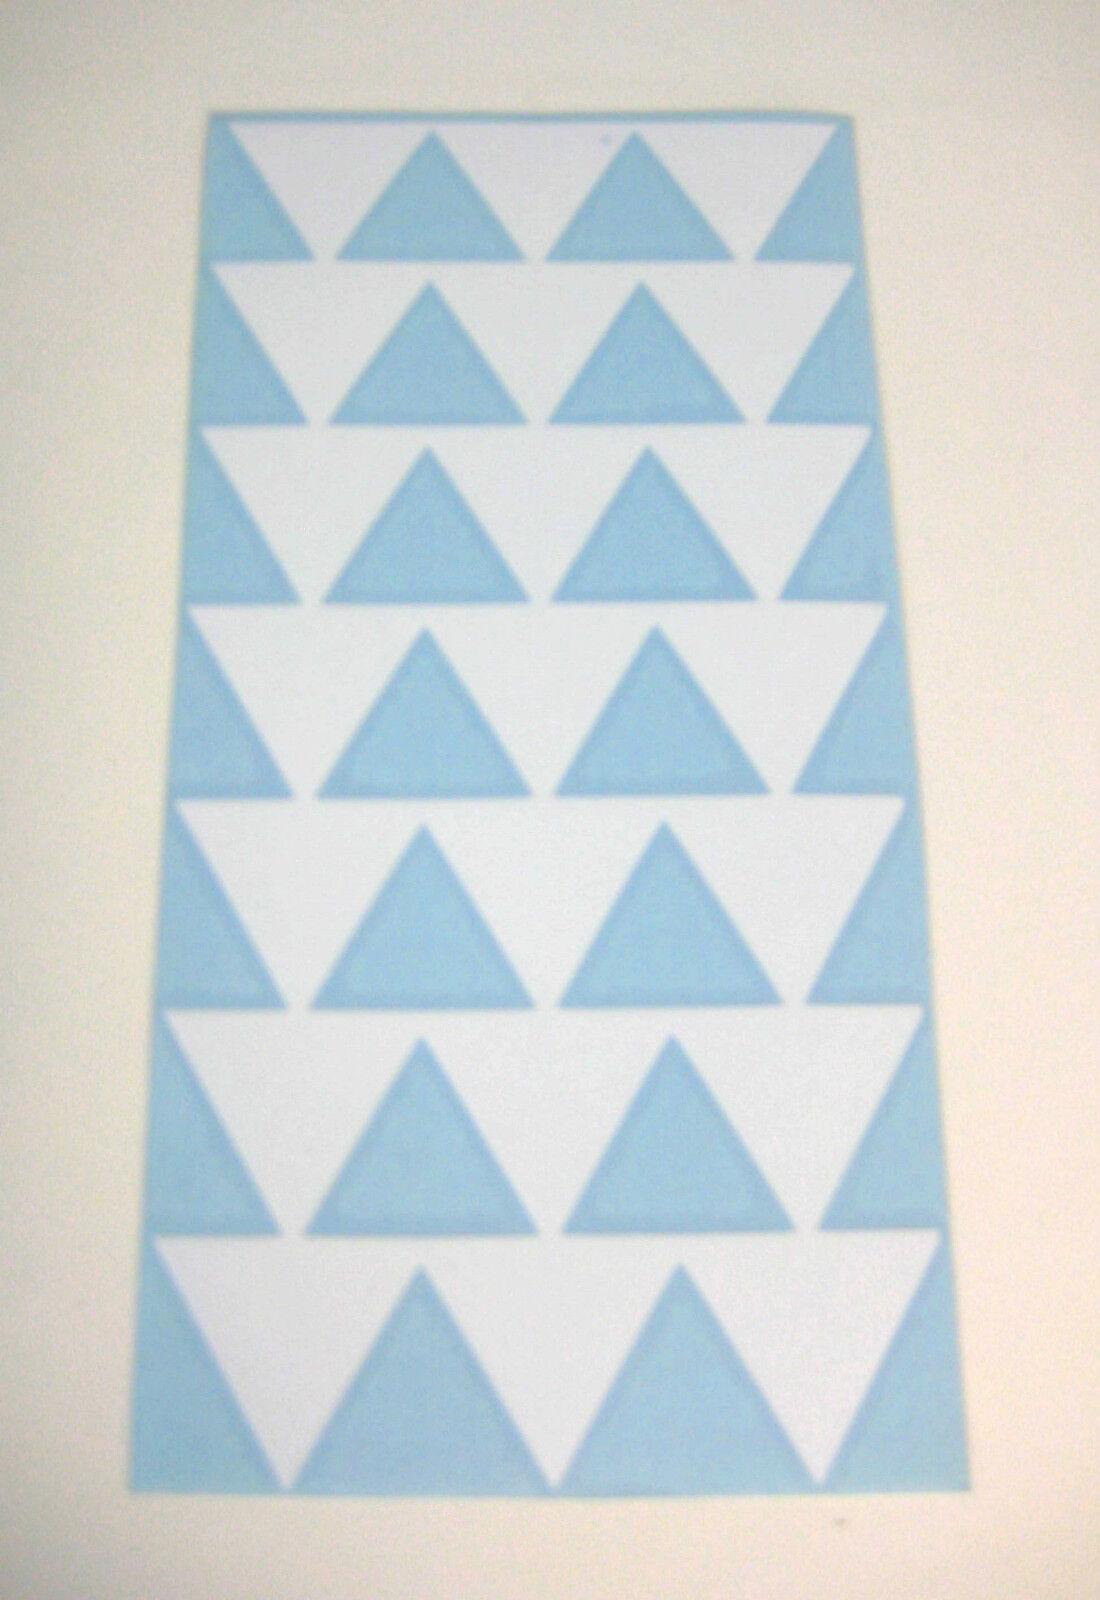 Hawaiian Tribal Triangles | www.imgkid.com - The Image Kid ...